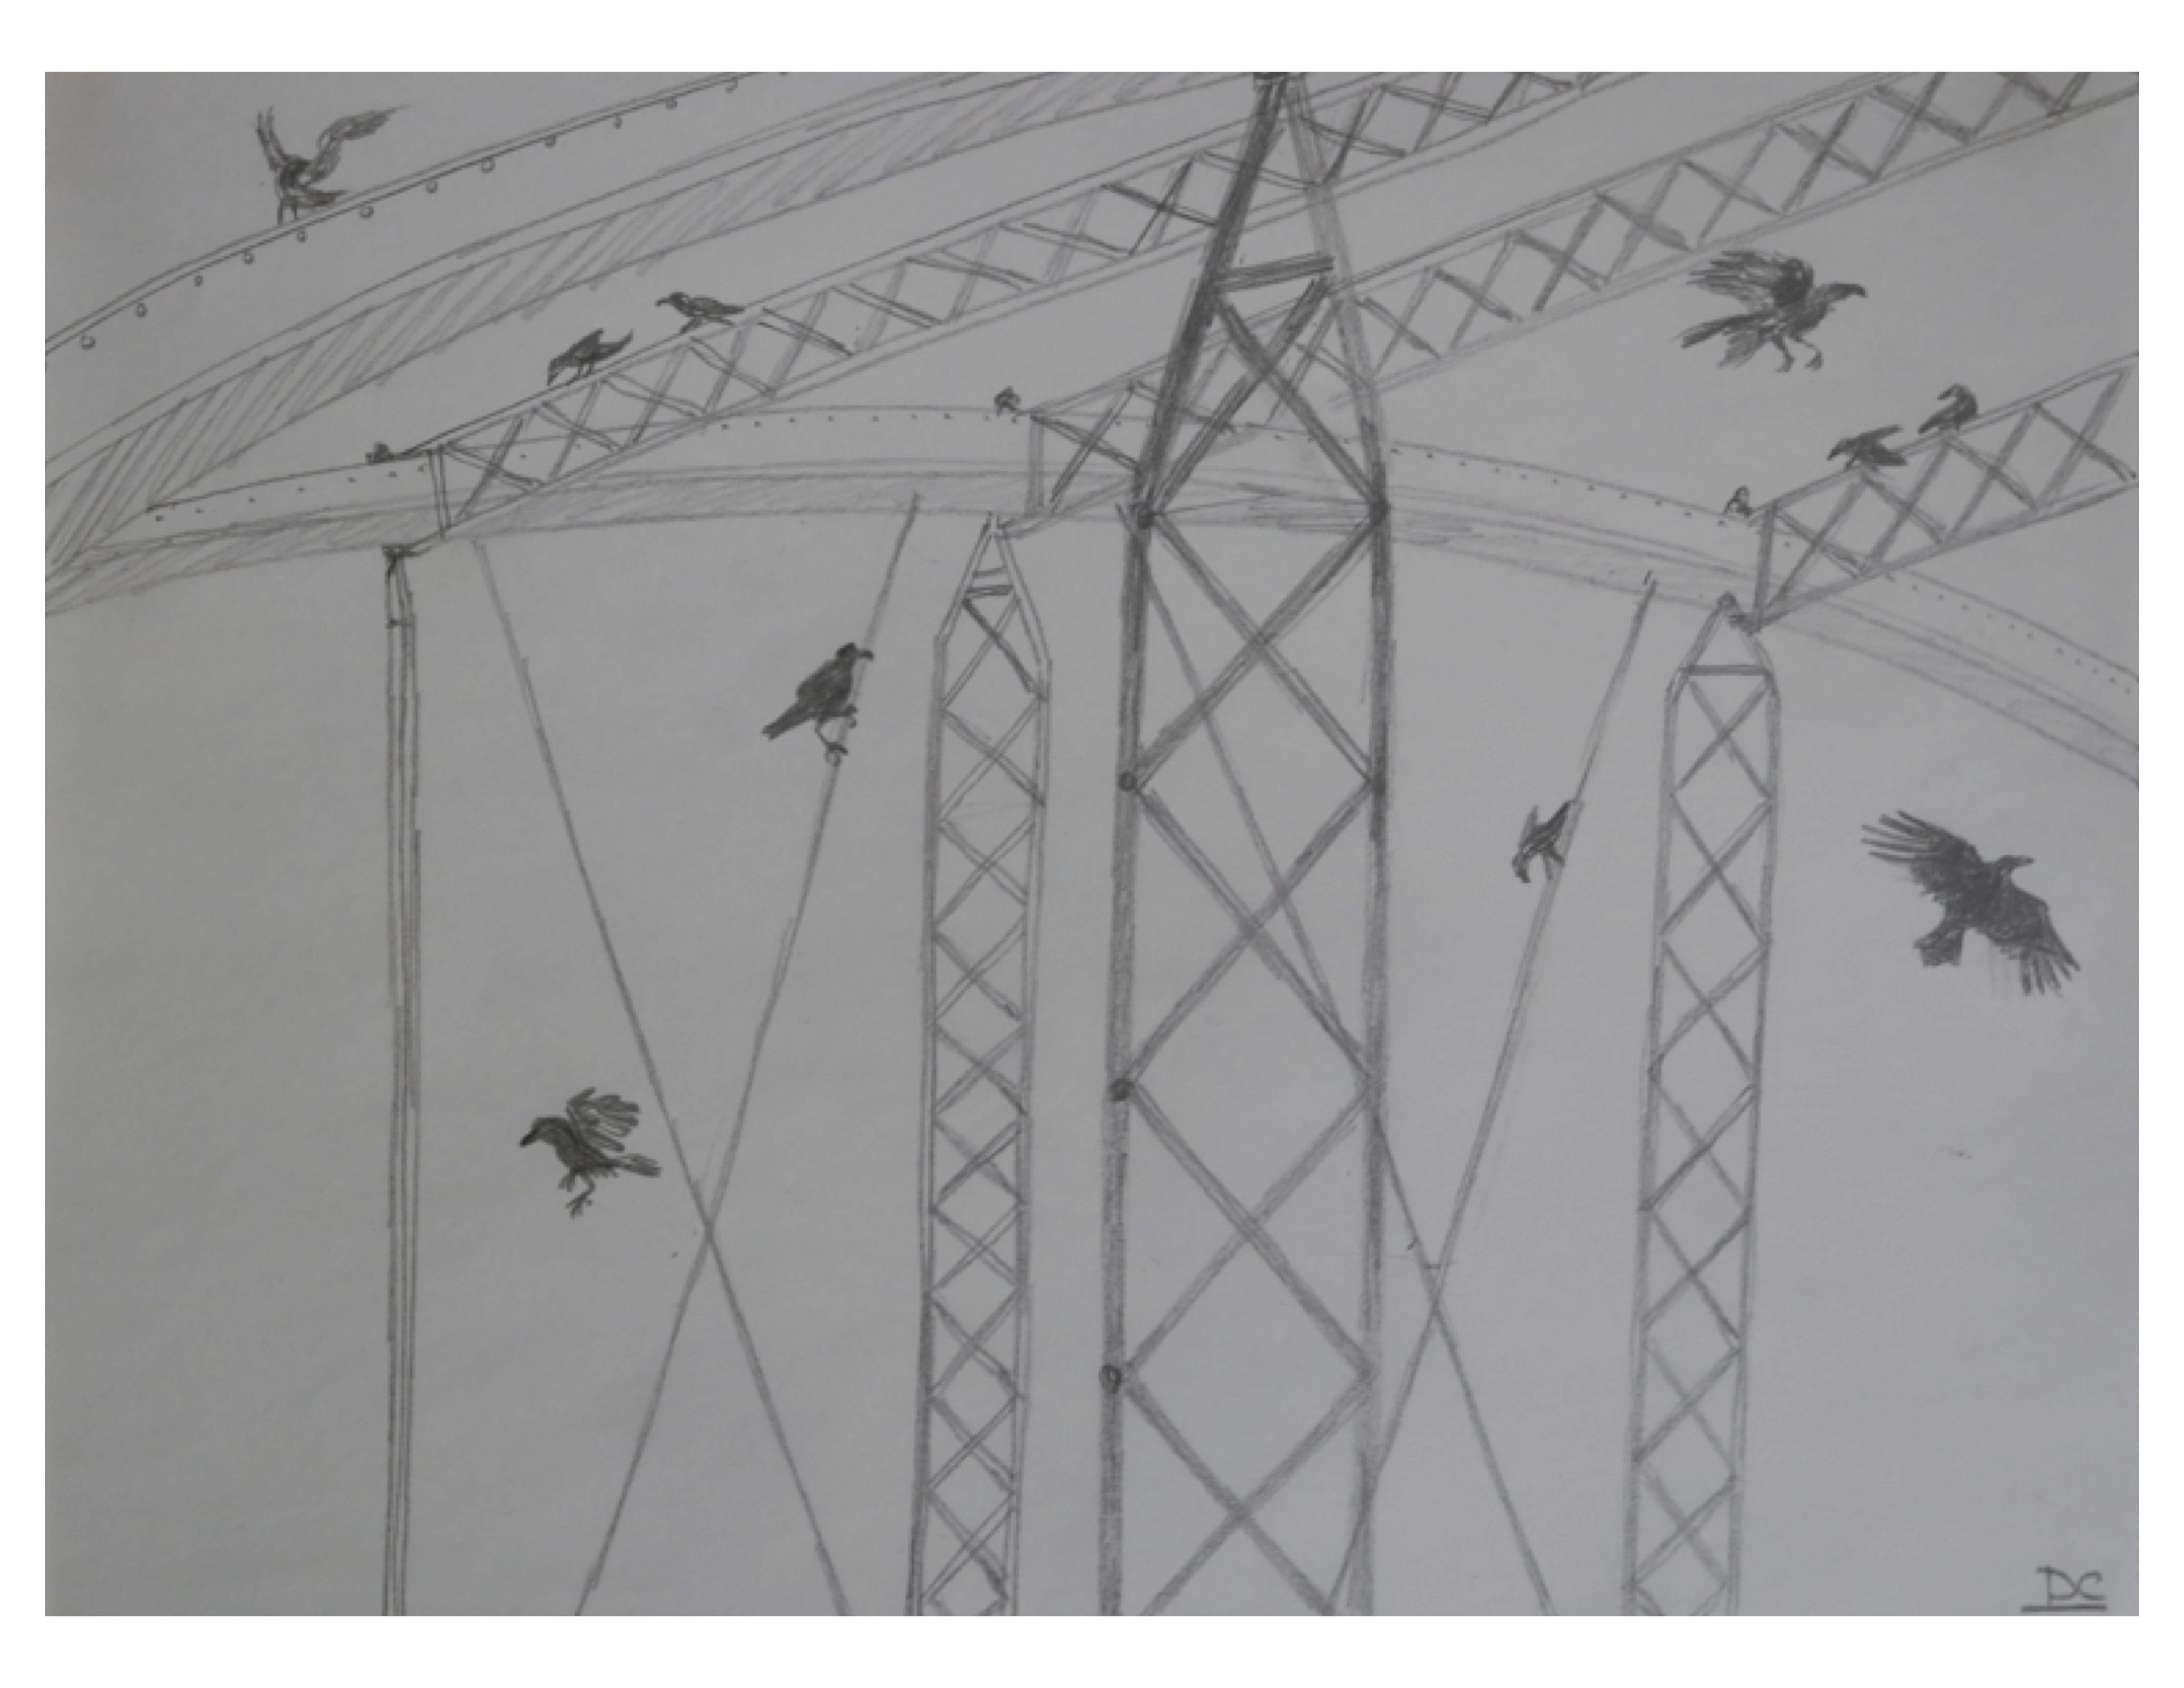 Study for crows at Blackfriars Bridge, Dec 8, 2016, pencil on paper, 28 cm x 21.5 cm